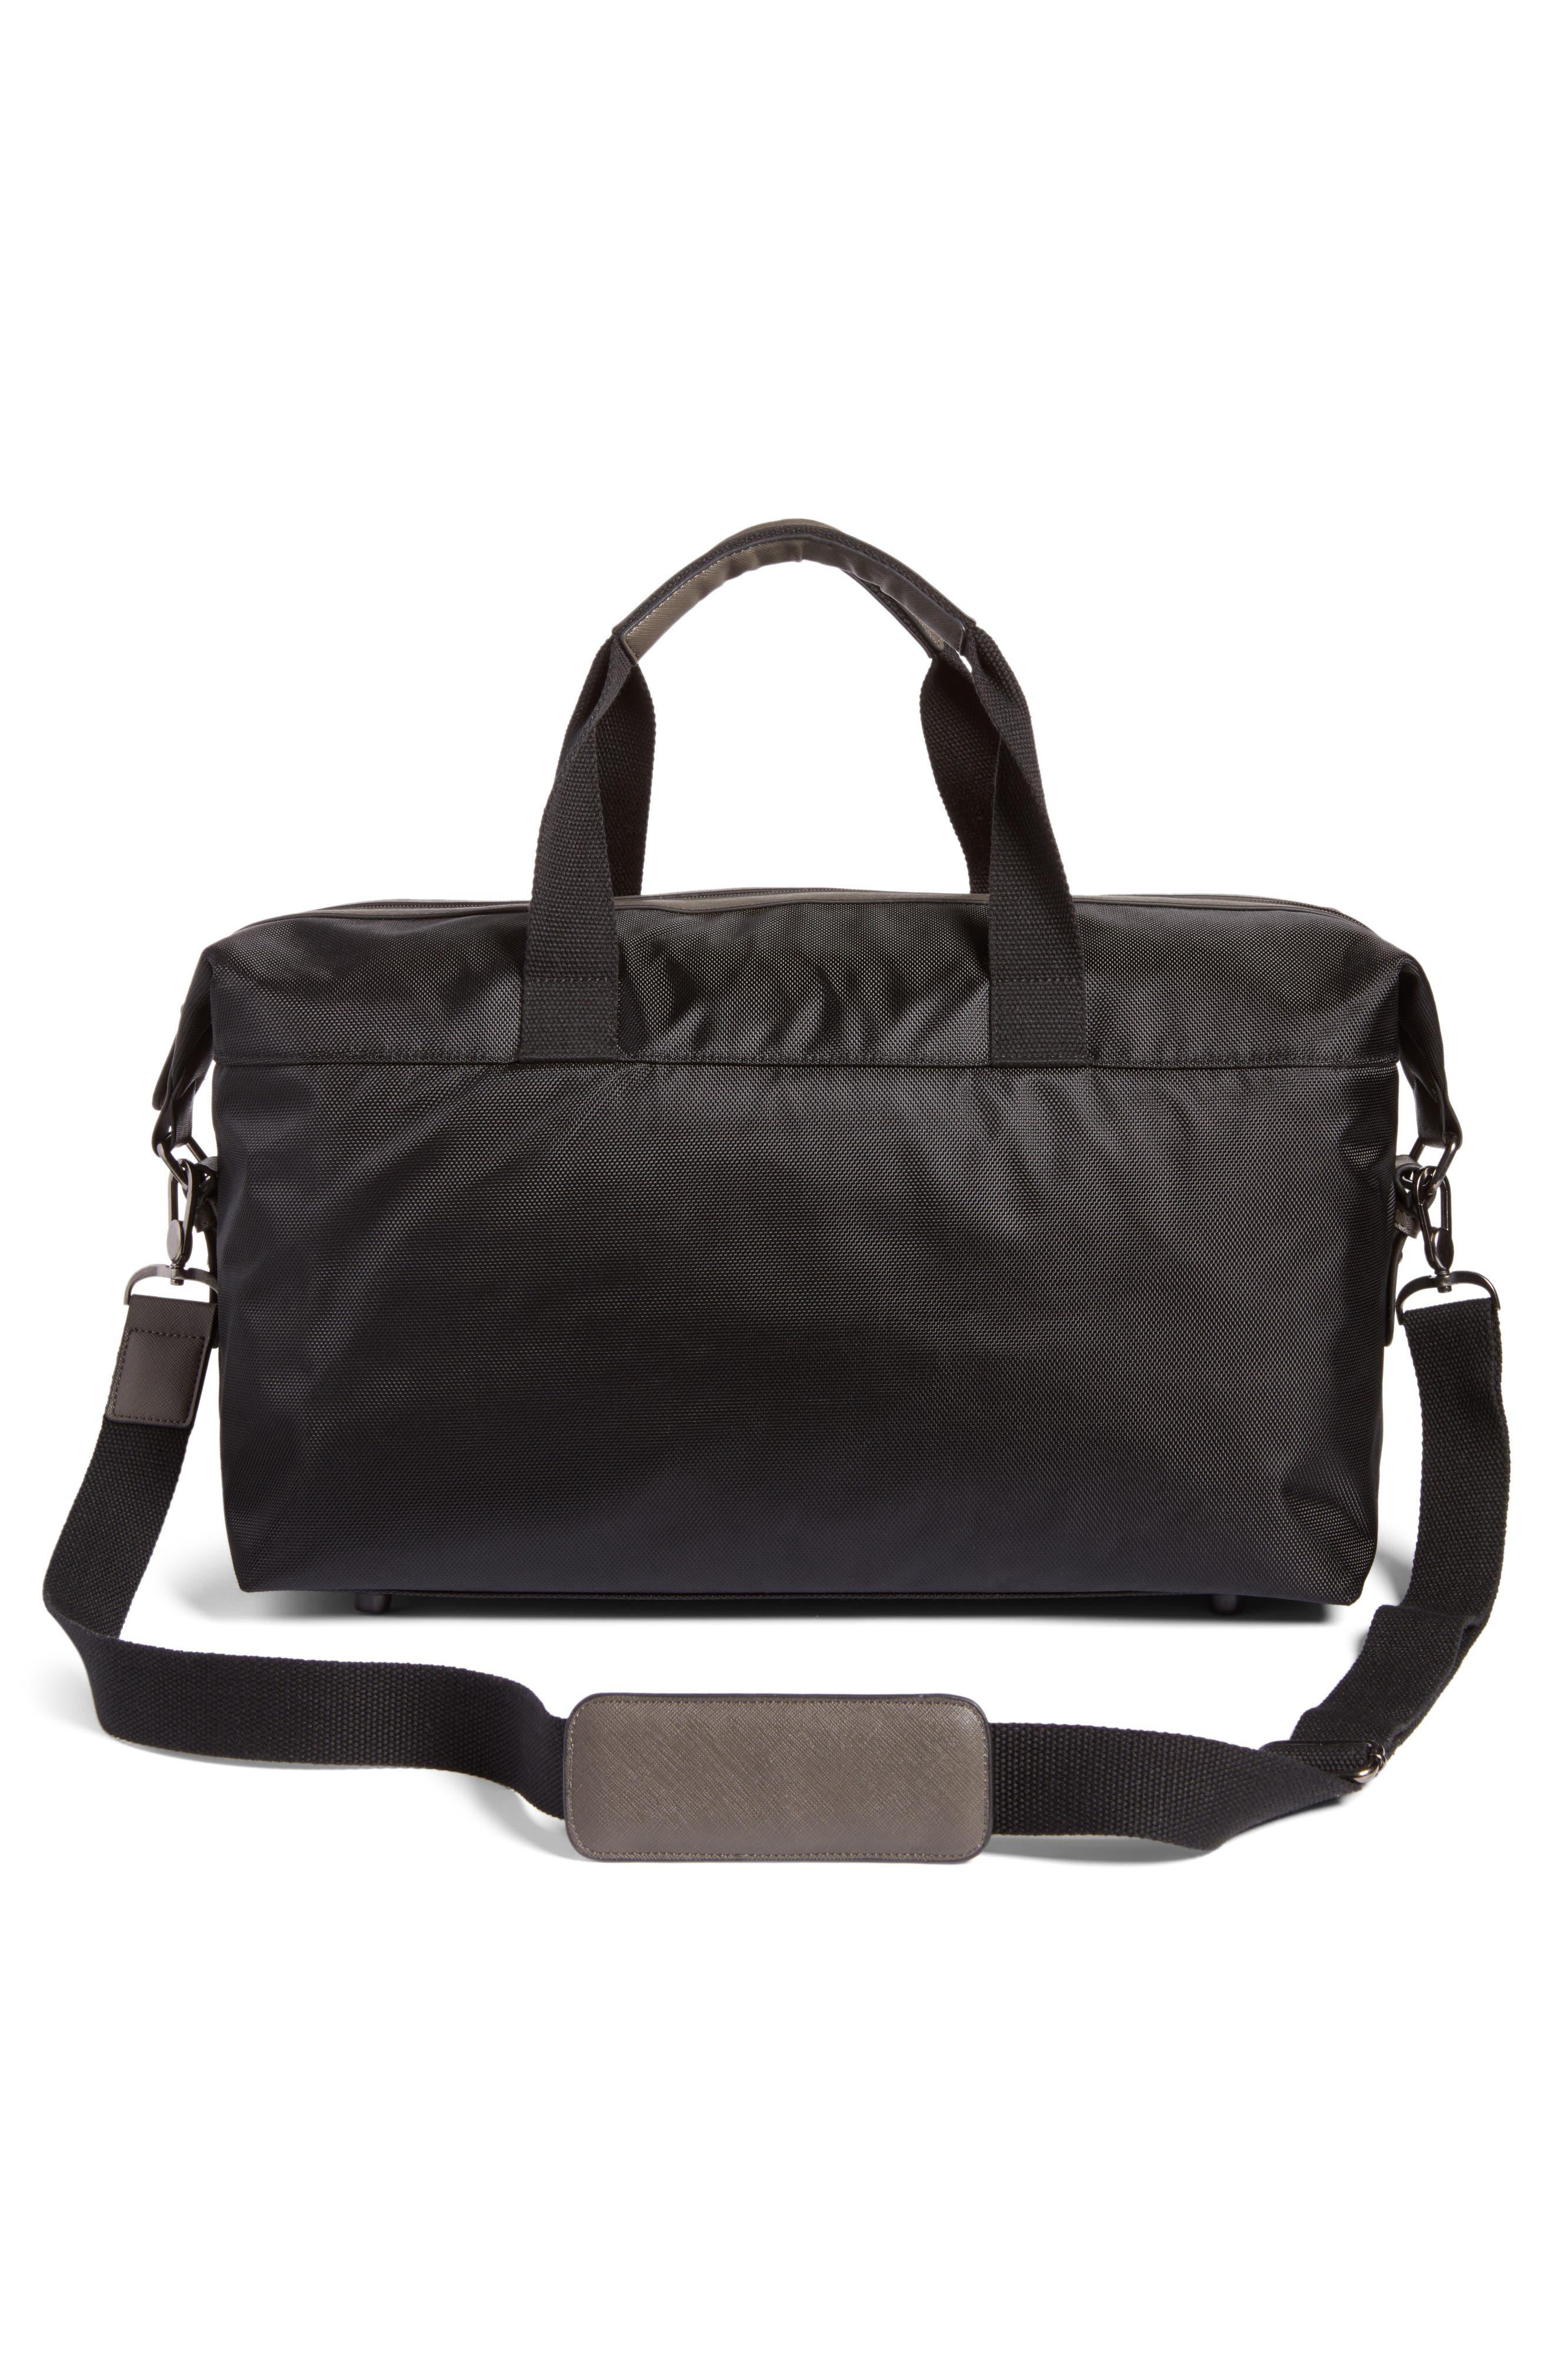 Zeebee Duffel Bag,                             Alternate thumbnail 3, color,                             001